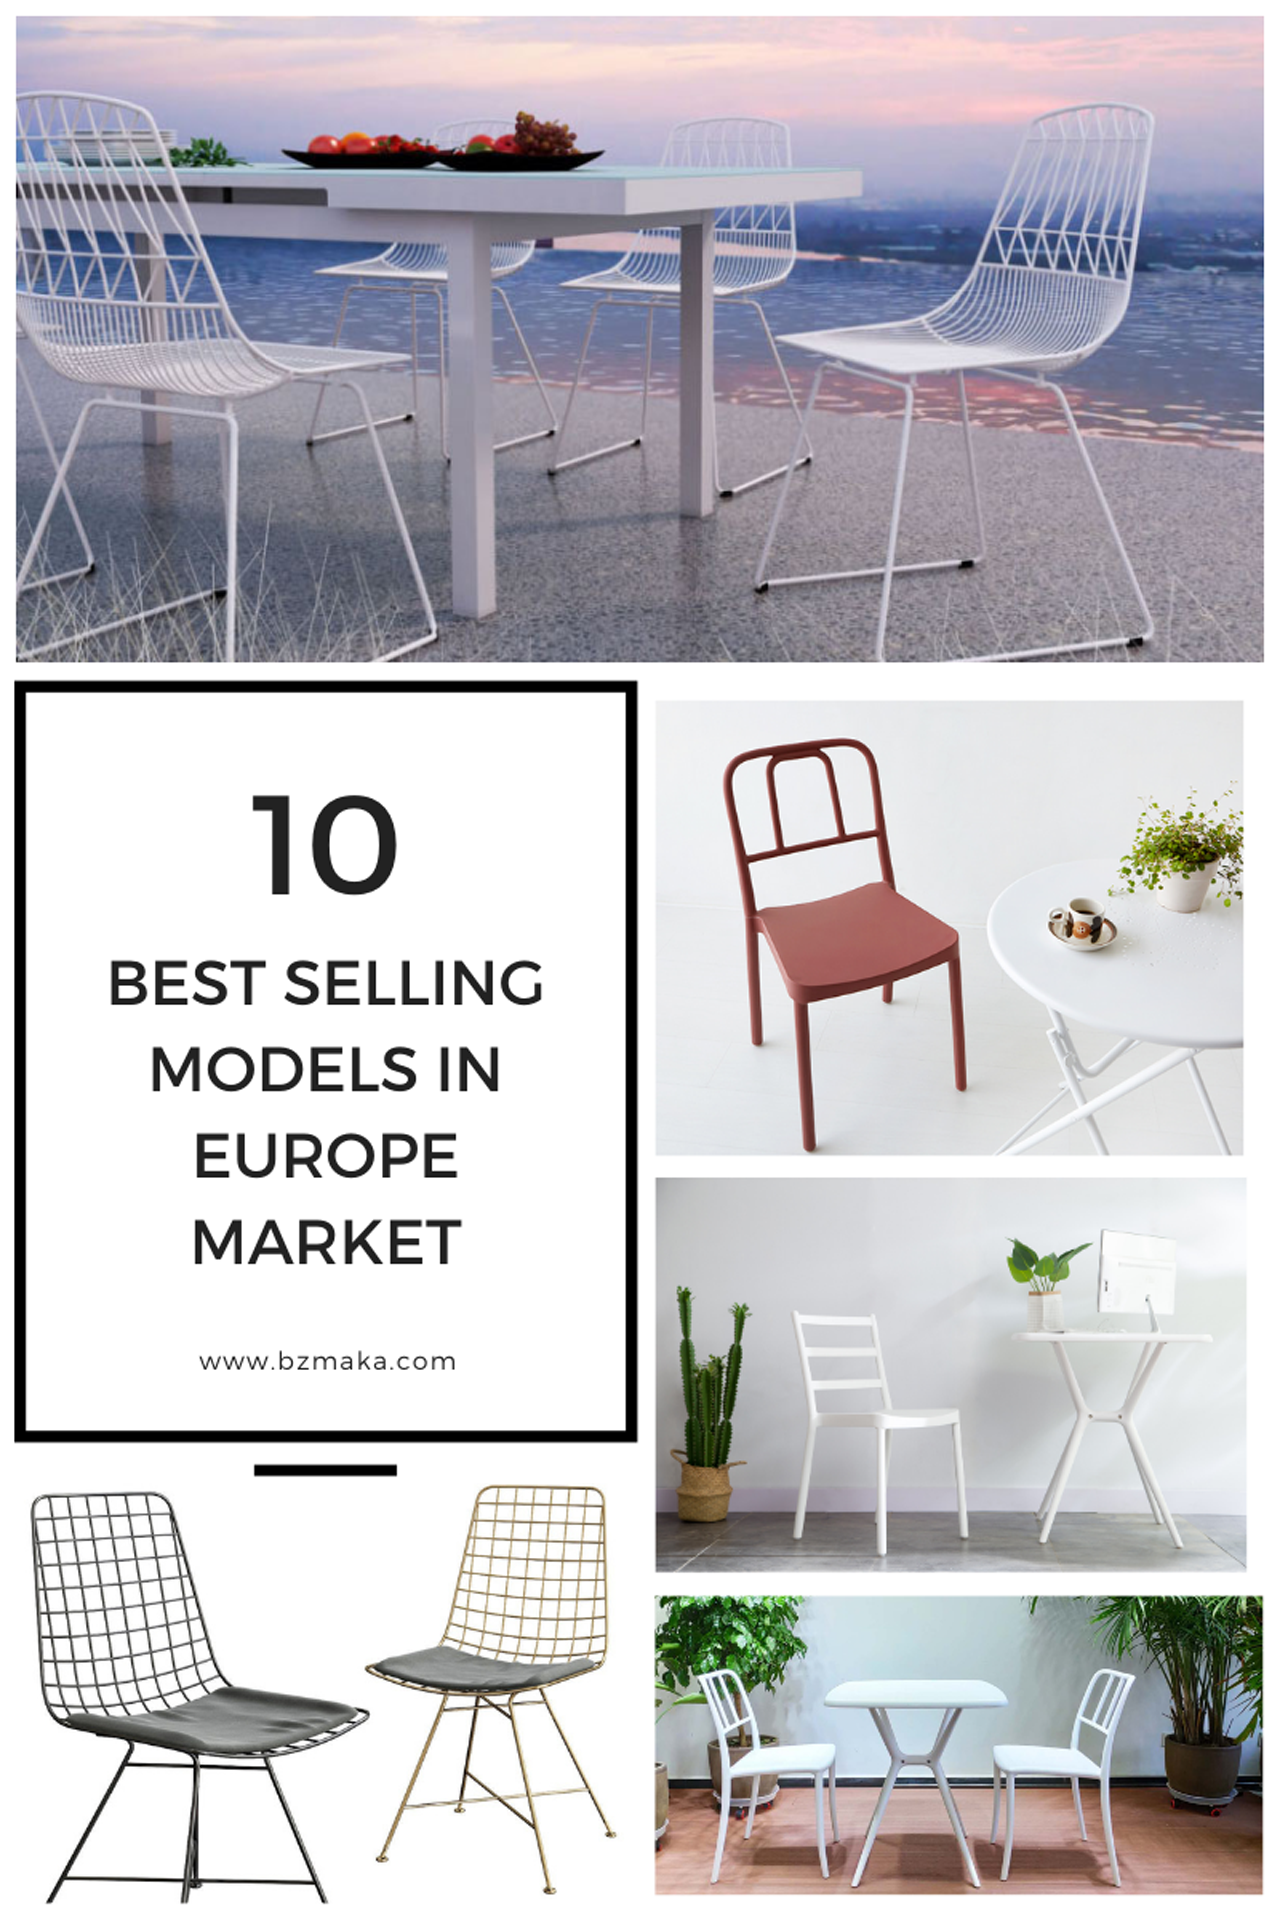 BEST-SELLING-MODELS-IN-europe-t